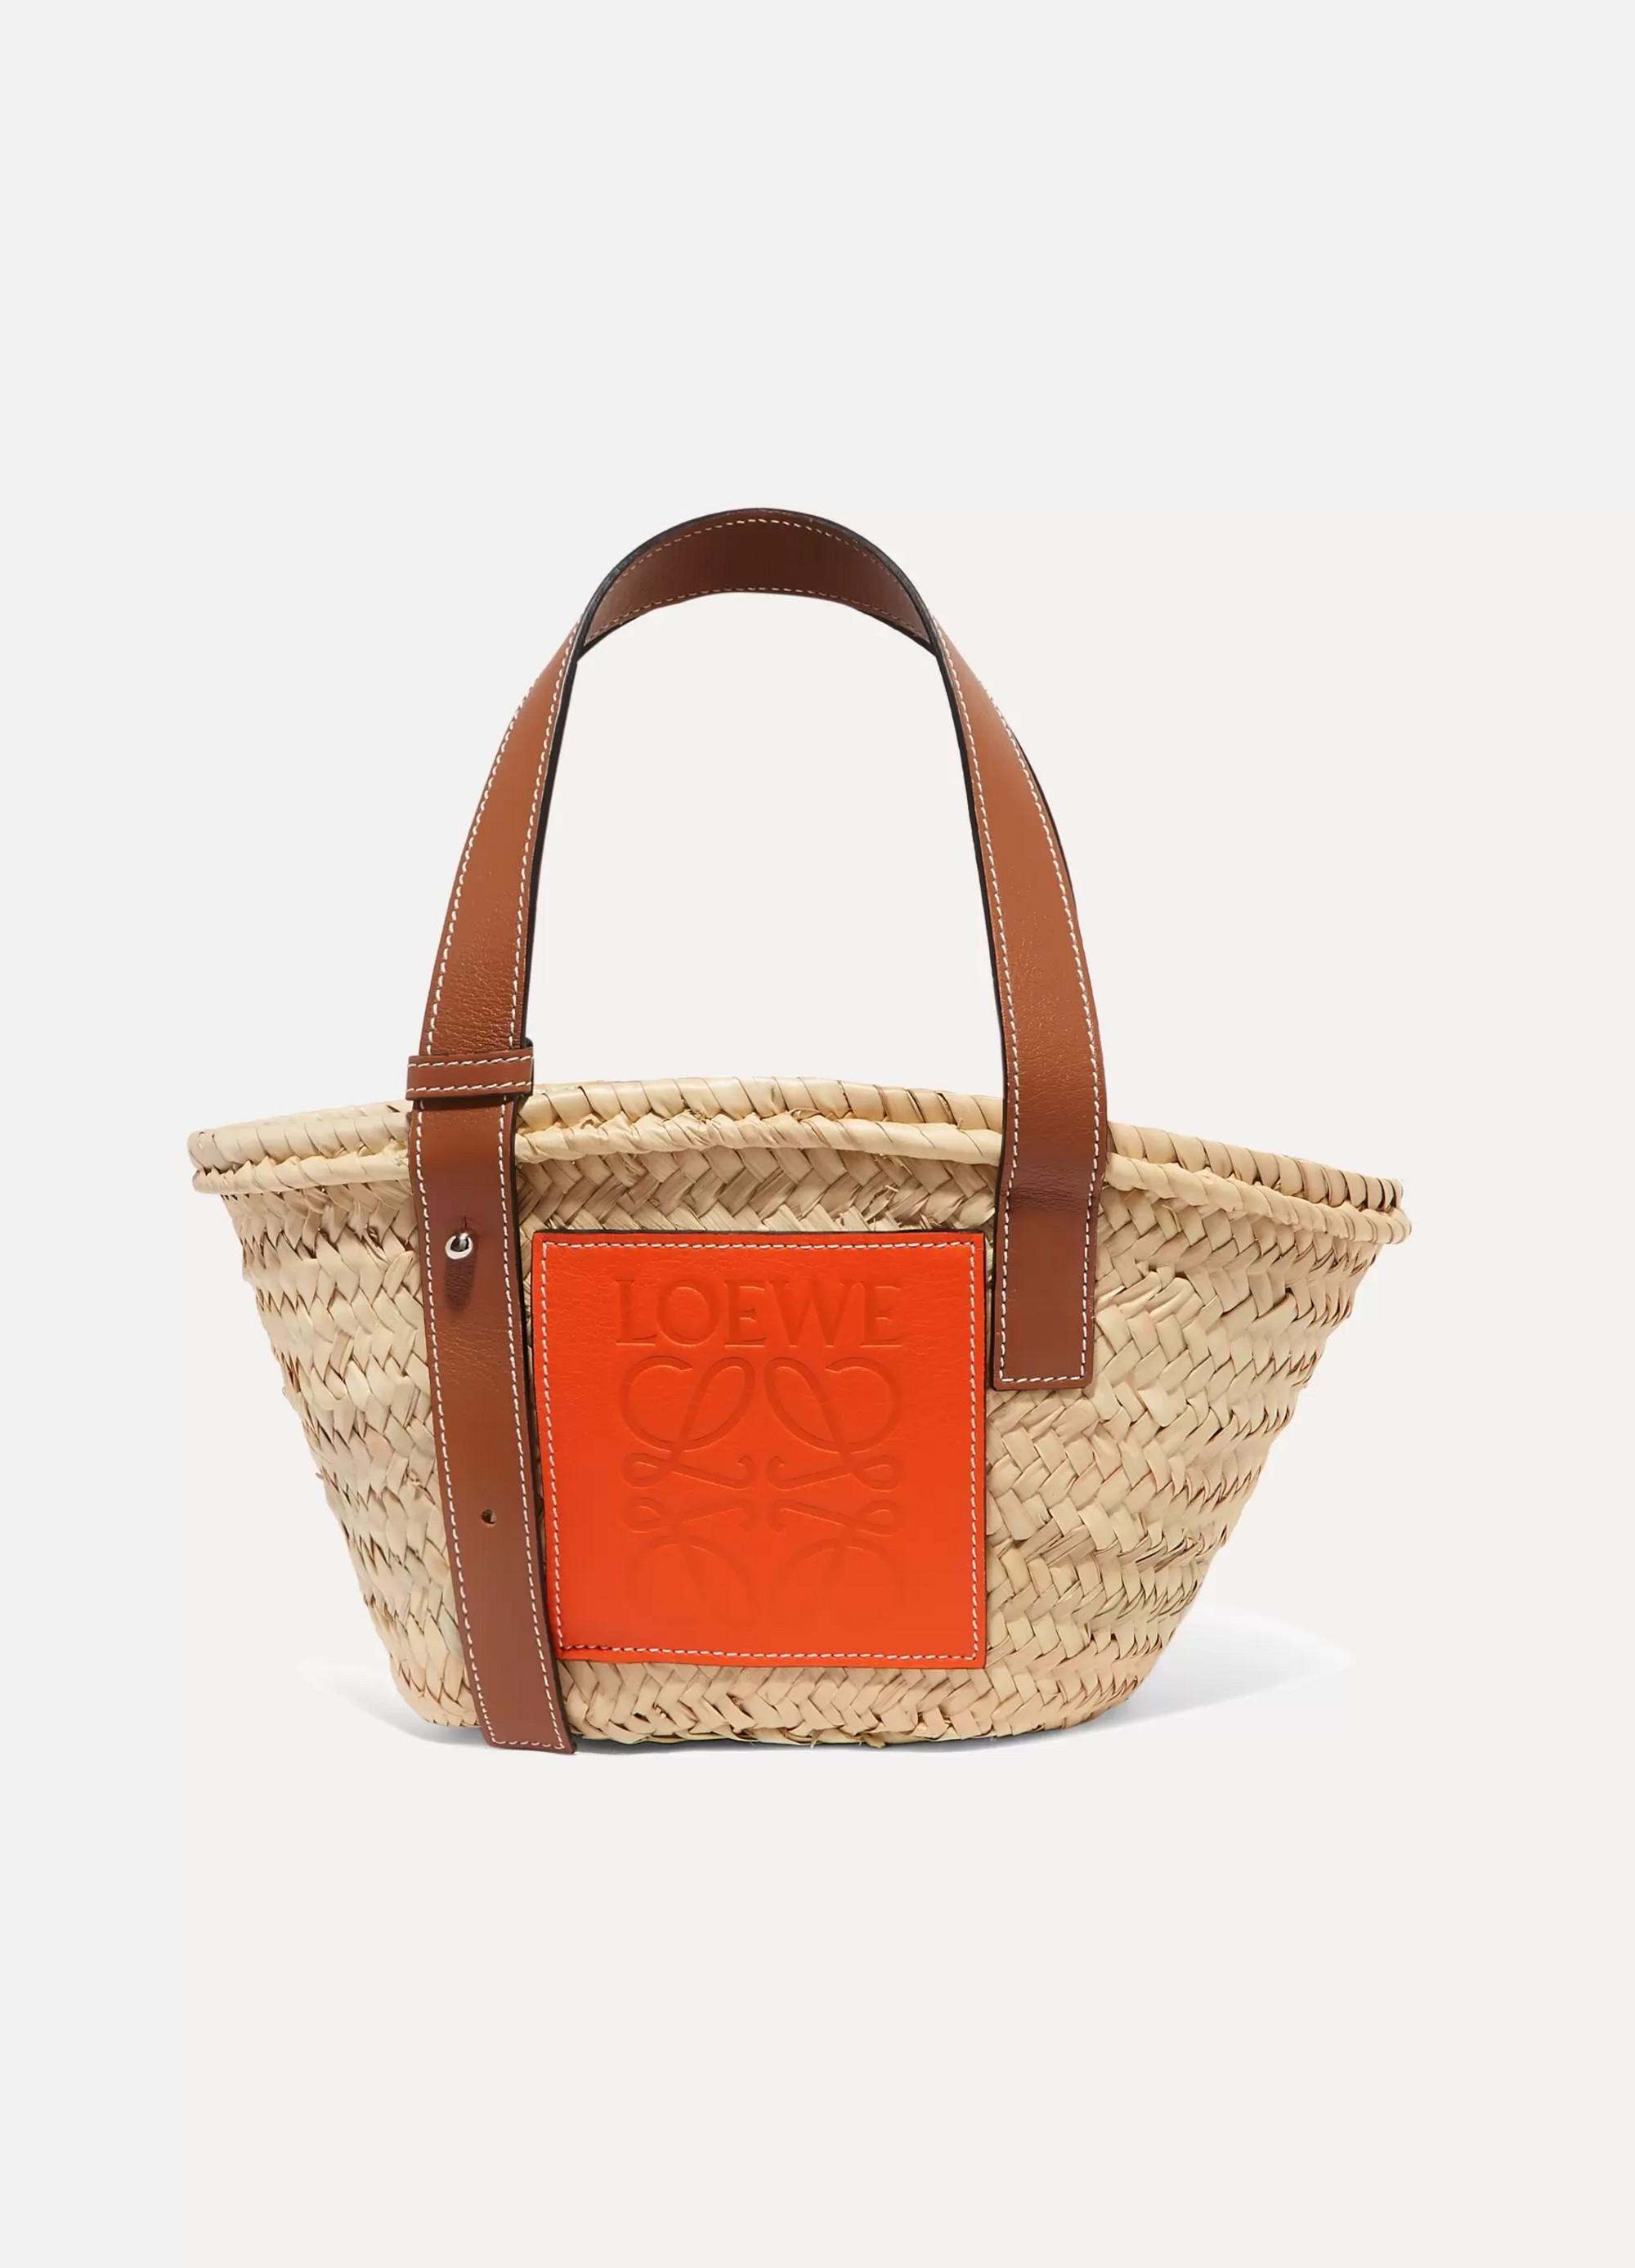 Loewe + Paula's Ibiza small leather-trimmed raffia tote